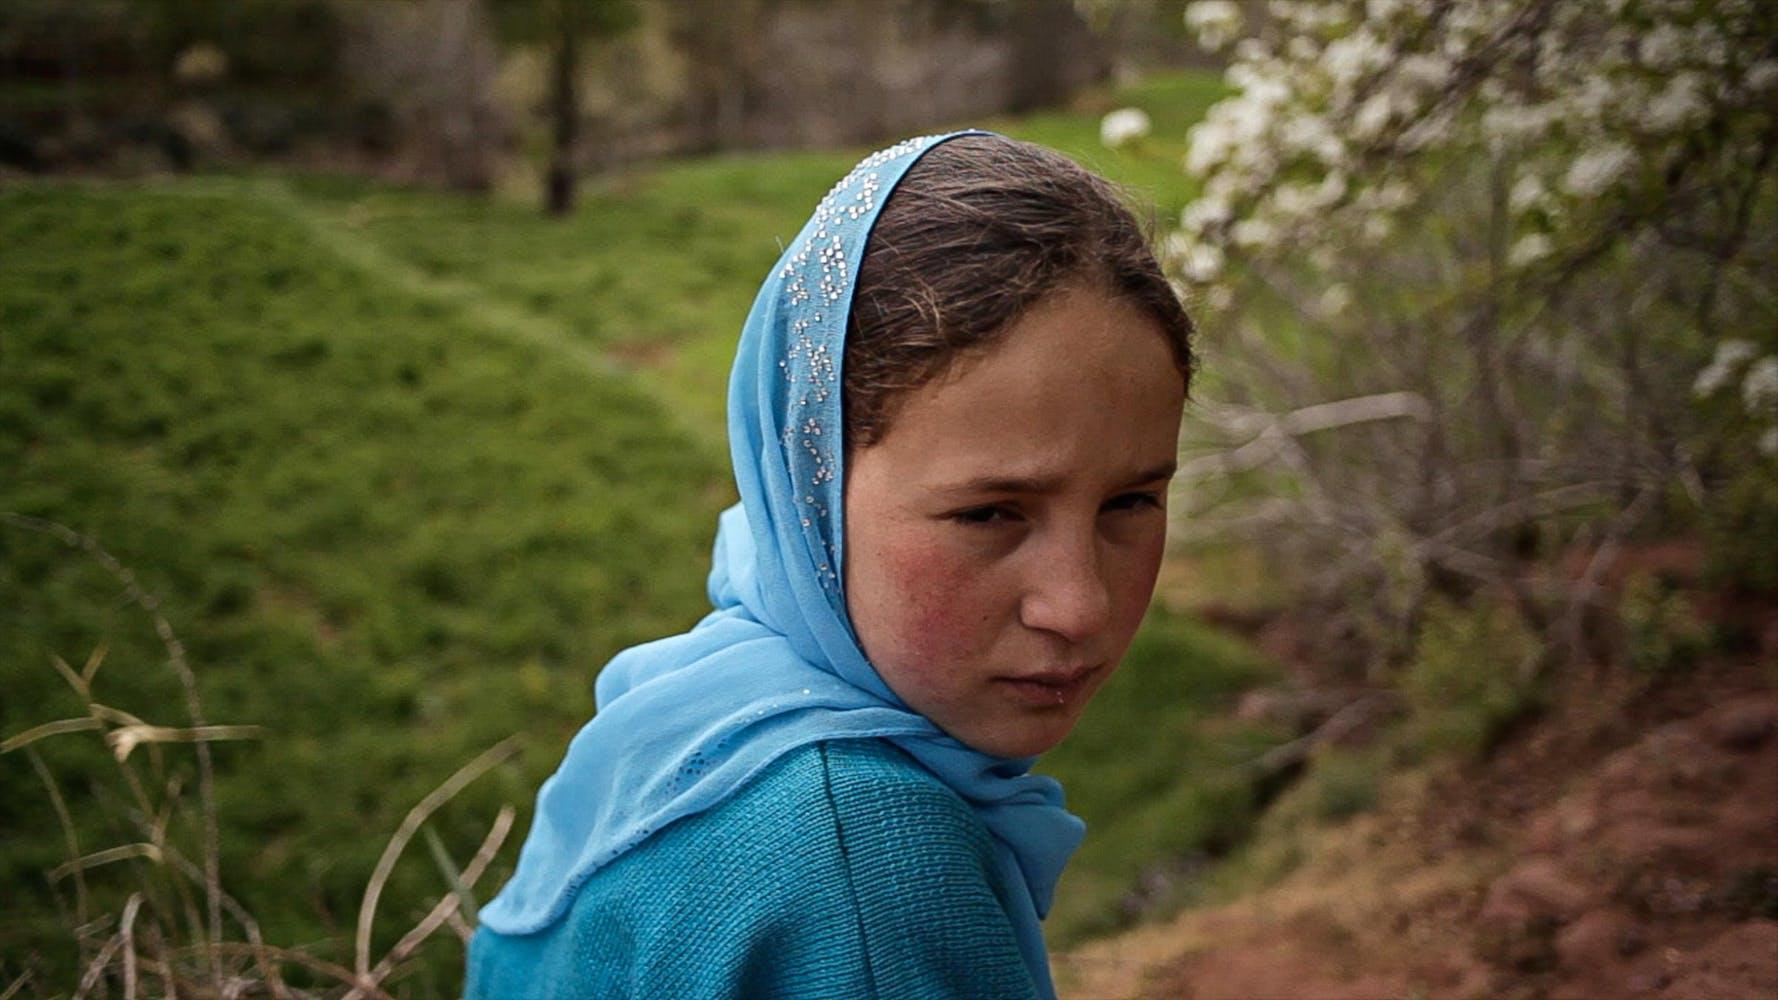 A girl in a blue headscarf sits in a field.